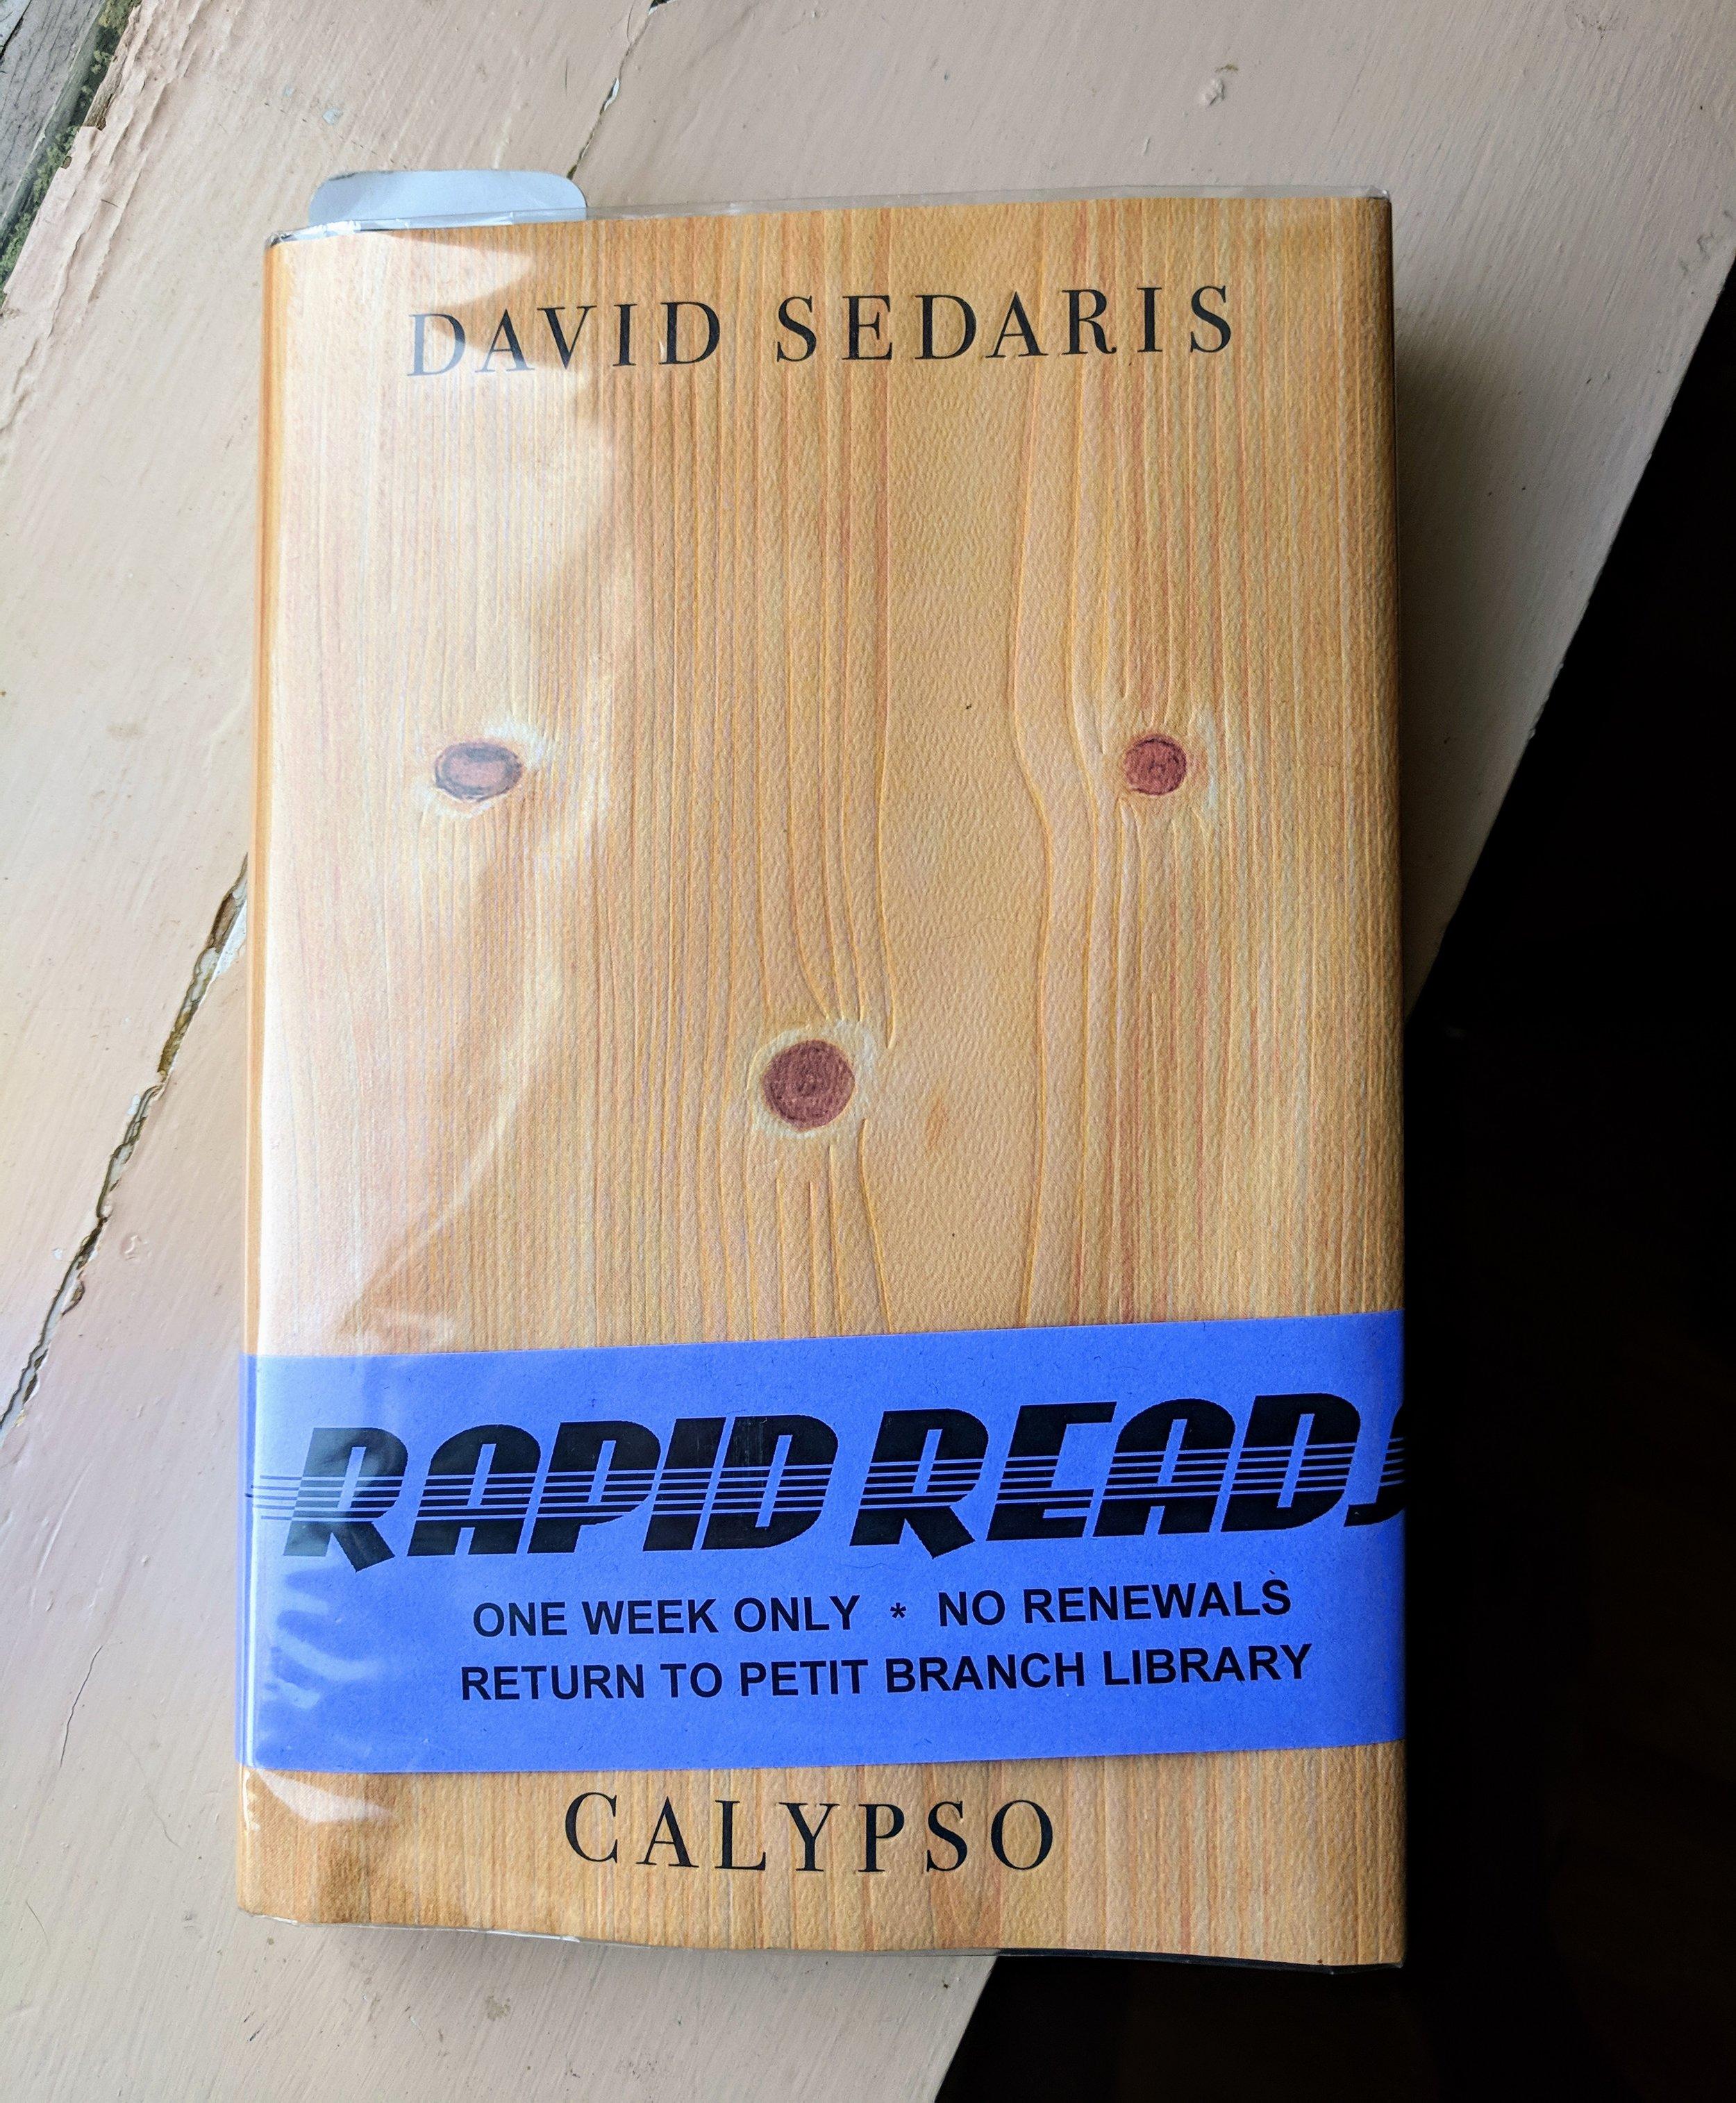 SedarisCalypso.jpg